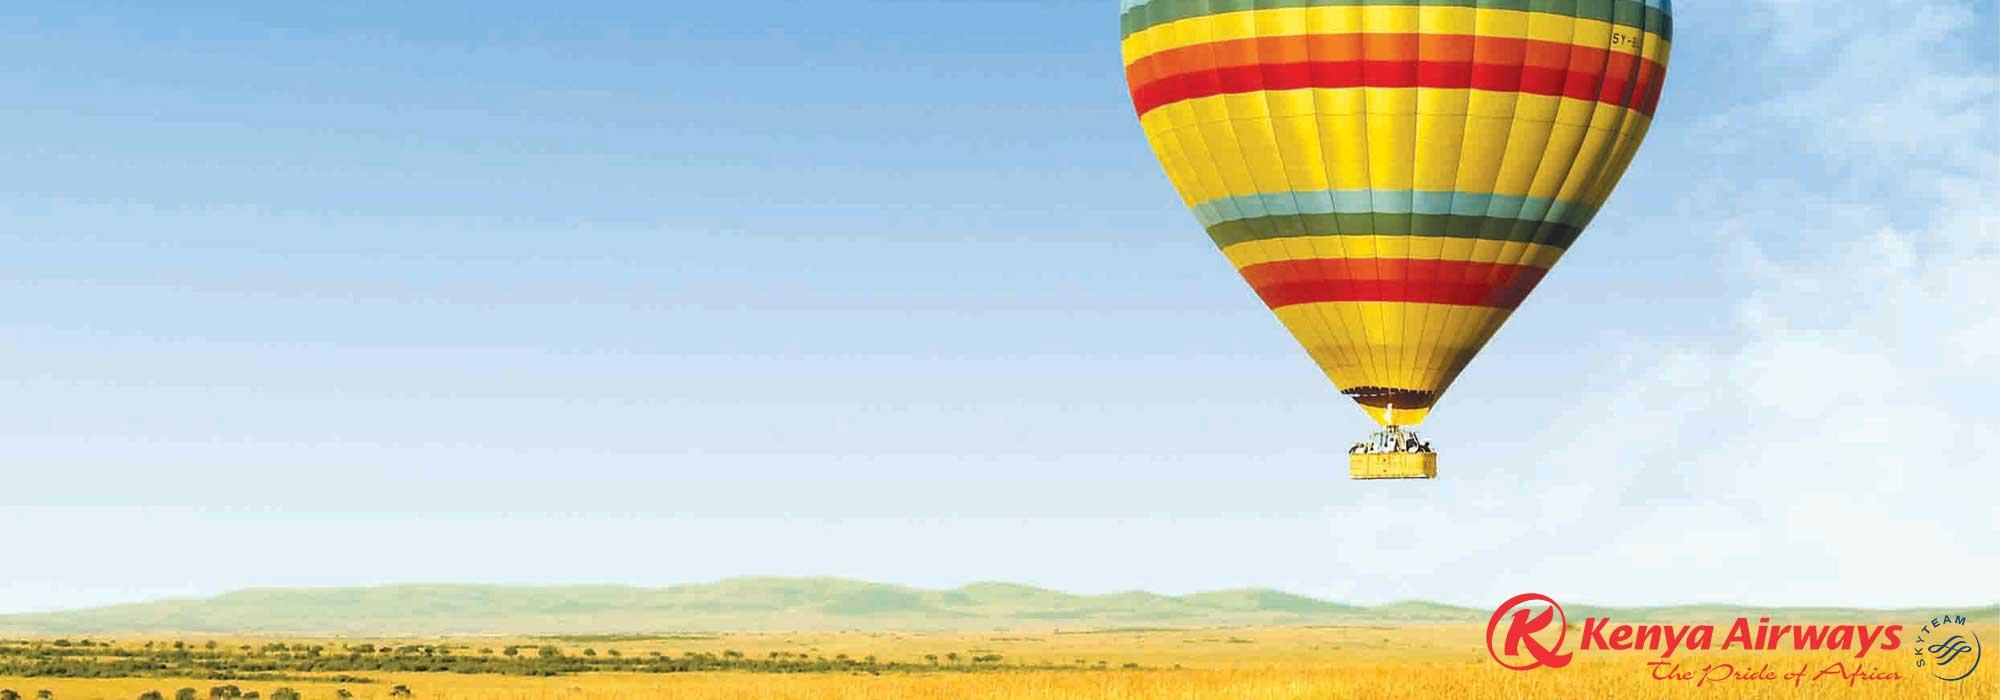 Hot Air Balloon in Kenya